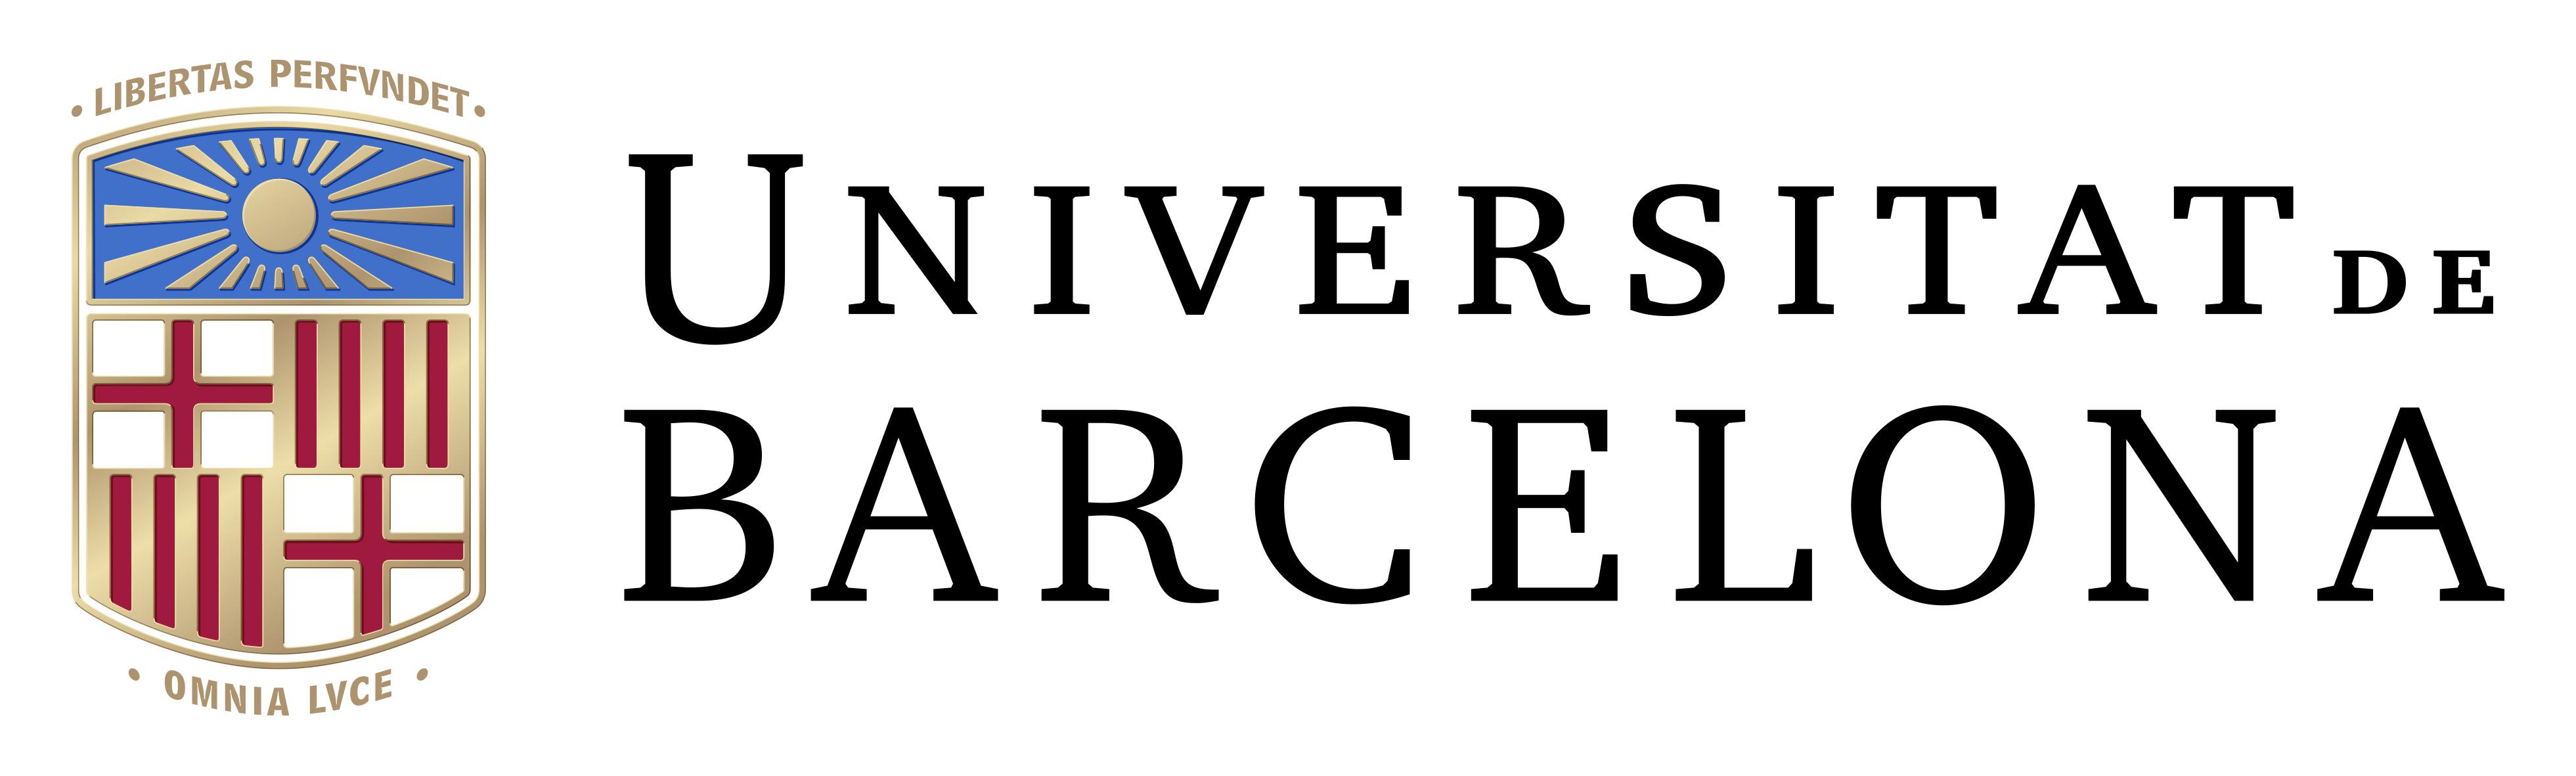 universitat-de-barcelona